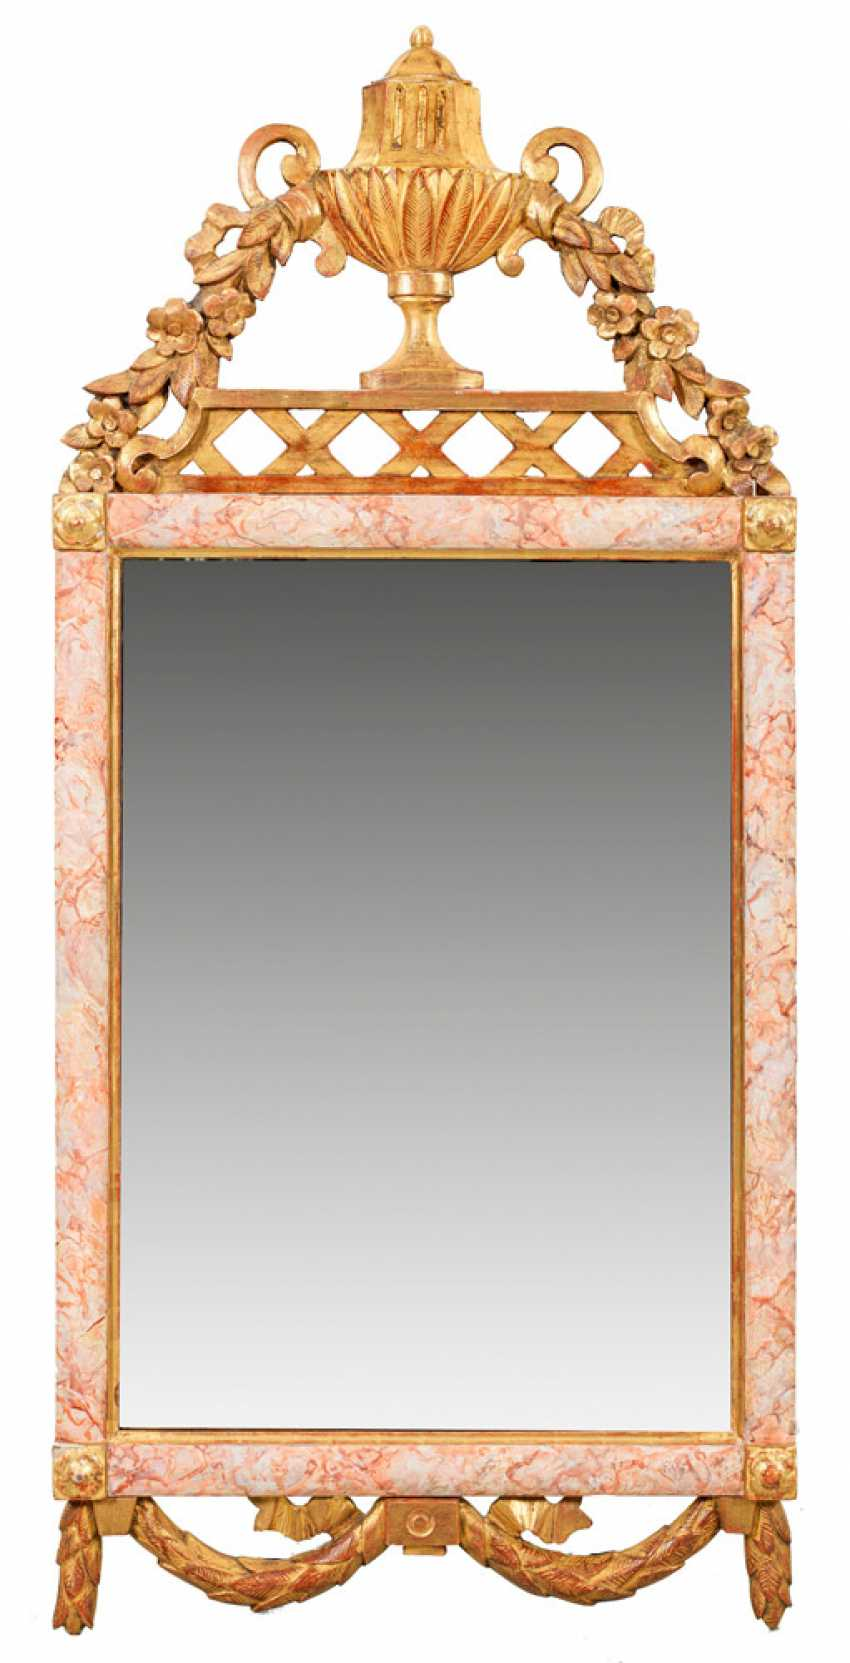 Rare Pair of Louis XVI wall mirror - photo 1